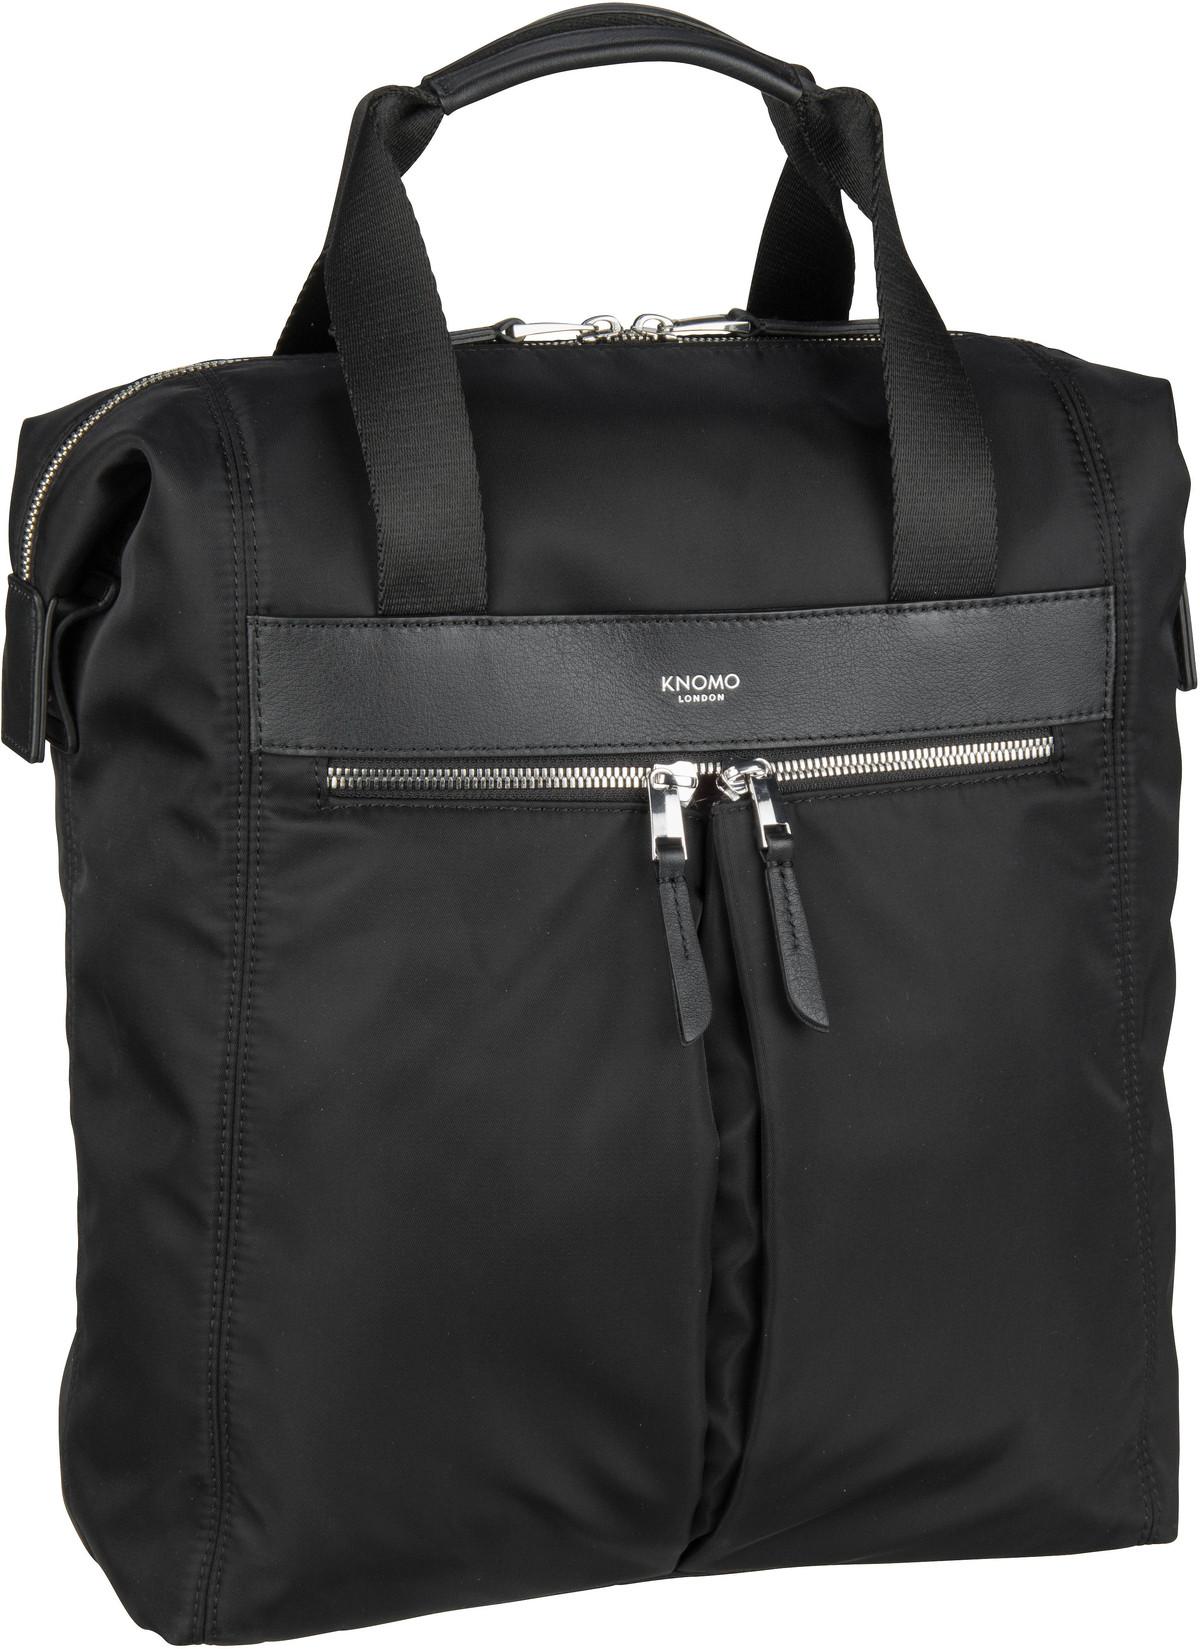 Rucksack / Daypack Mayfair Mini Chiltern 13'' Black/Silver (11.8 Liter)